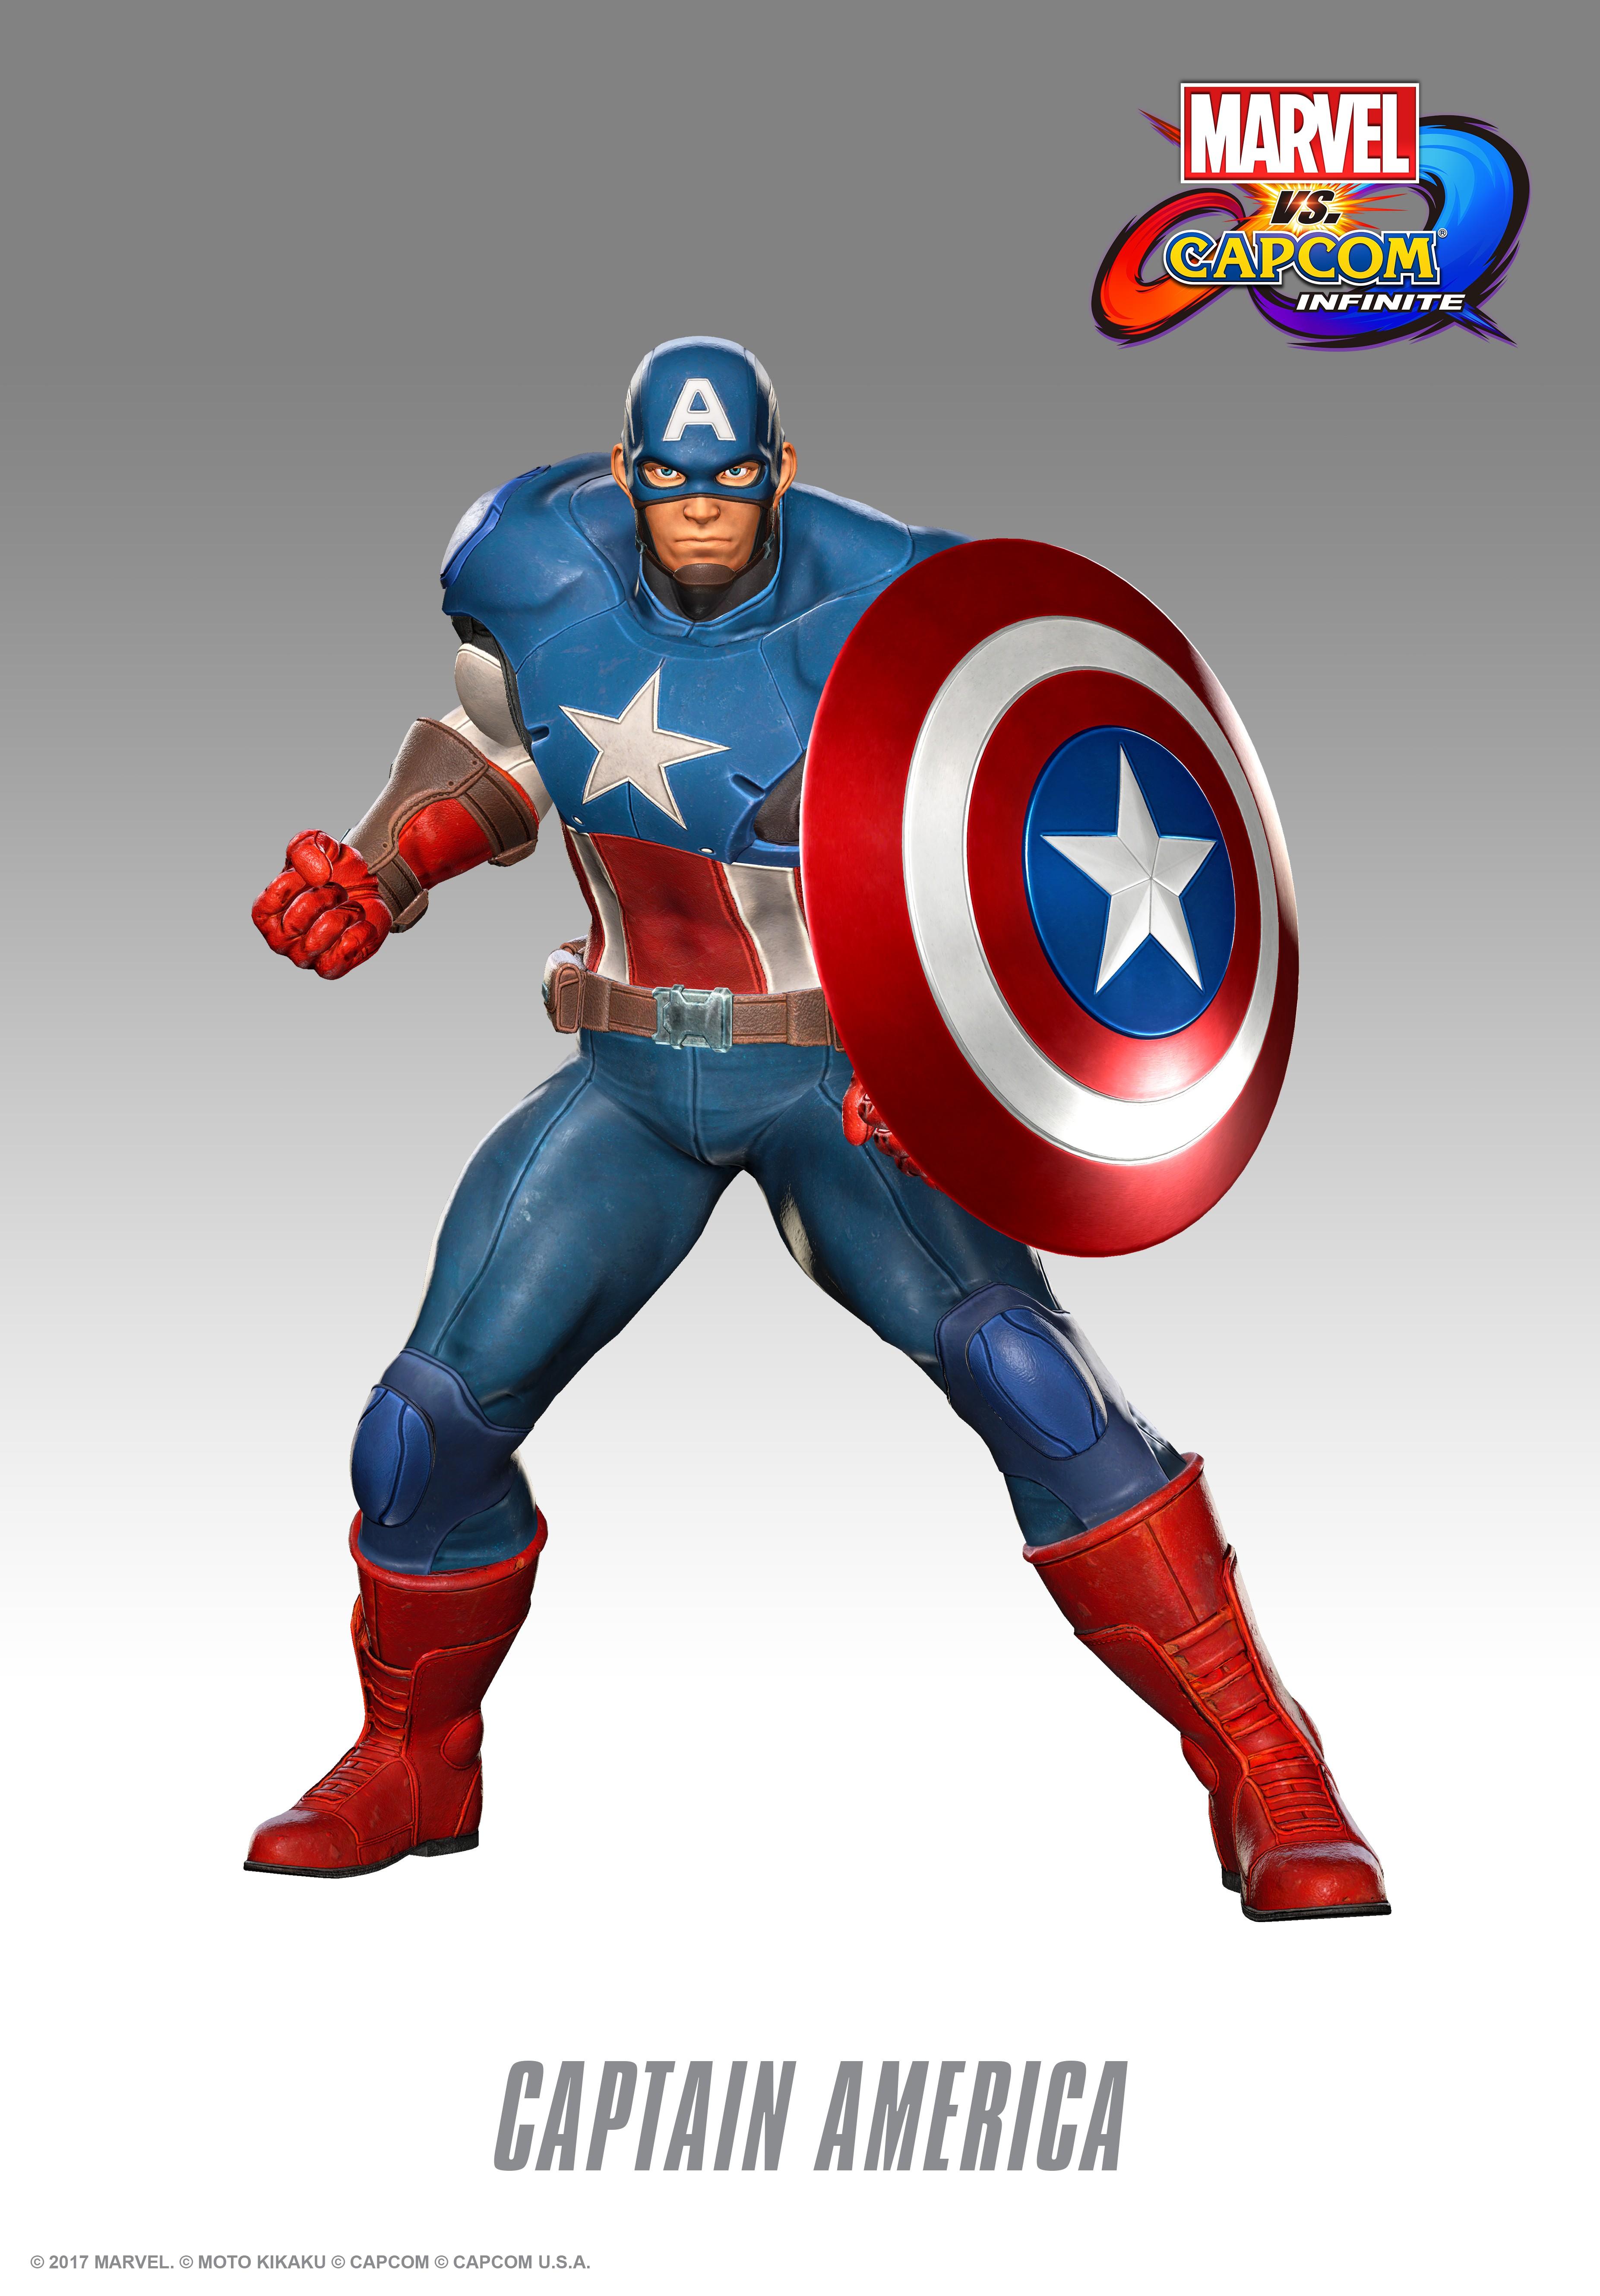 Капитан Америка - Marvel vs. Capcom: Infinite Арт, Персонаж